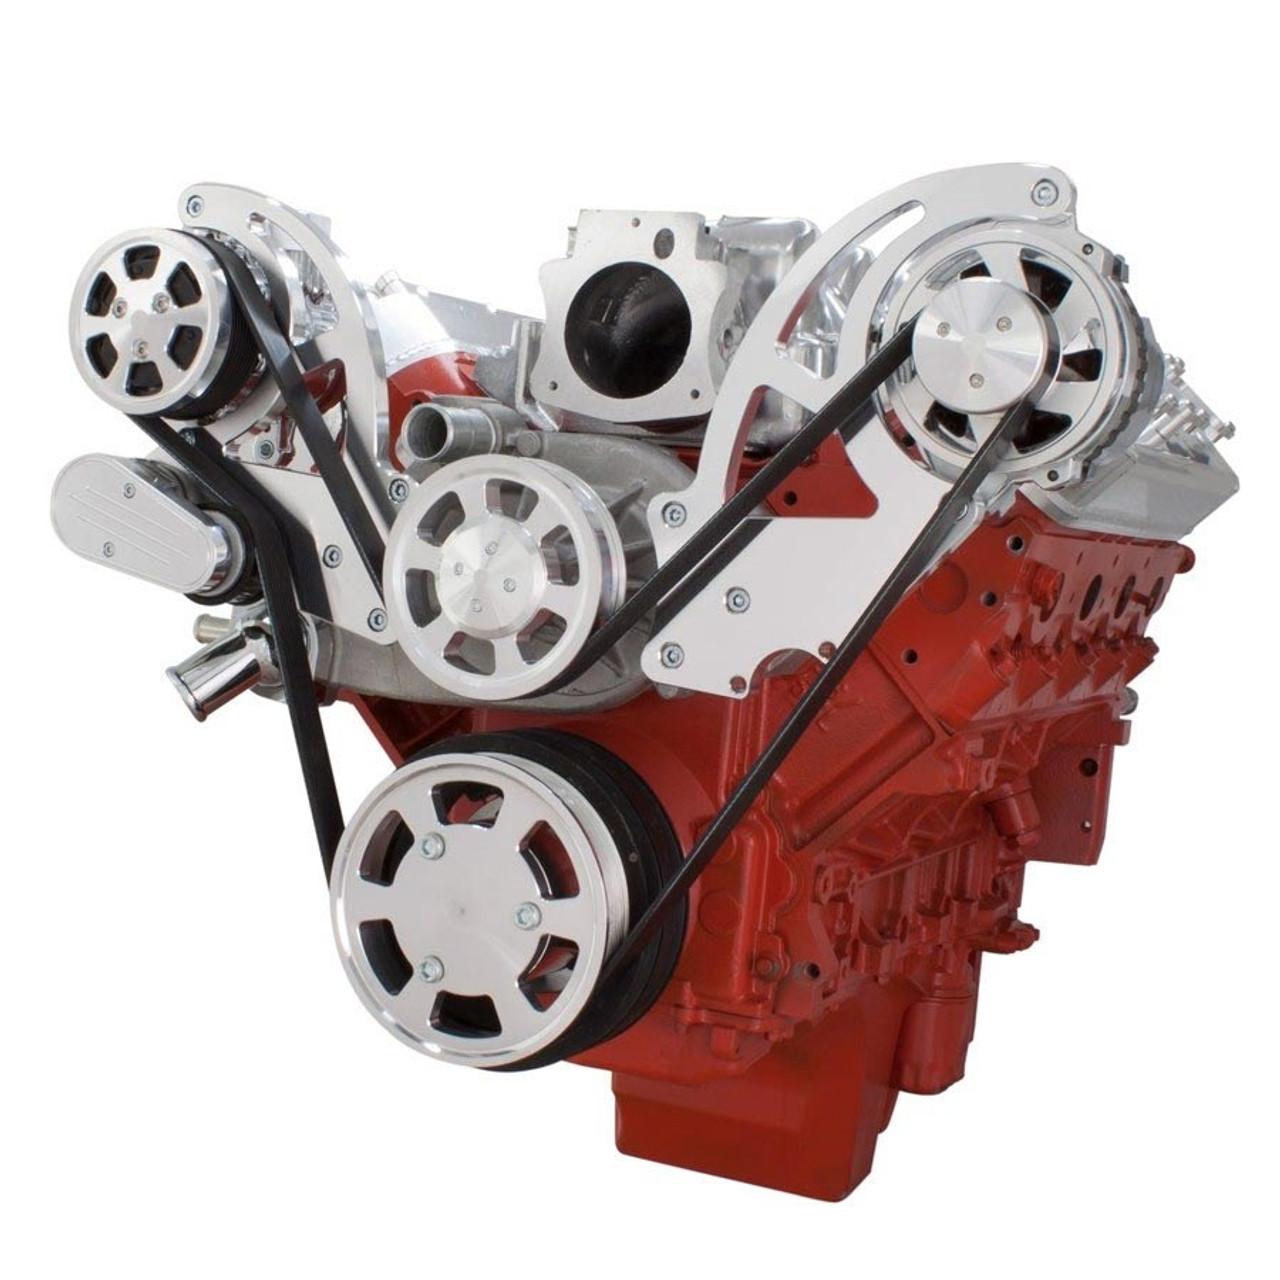 1967 Camaro Engine Wiring Harness Diagram On 1967 Camaro Painless